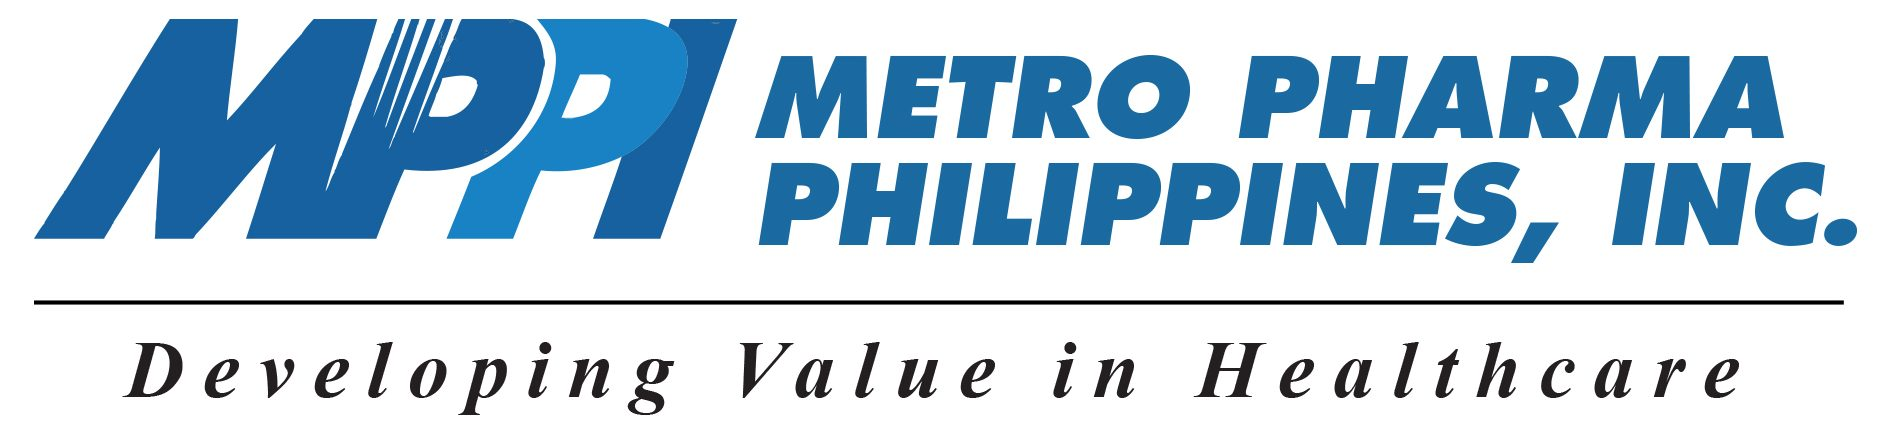 Metro Pharma Phils. Inc.